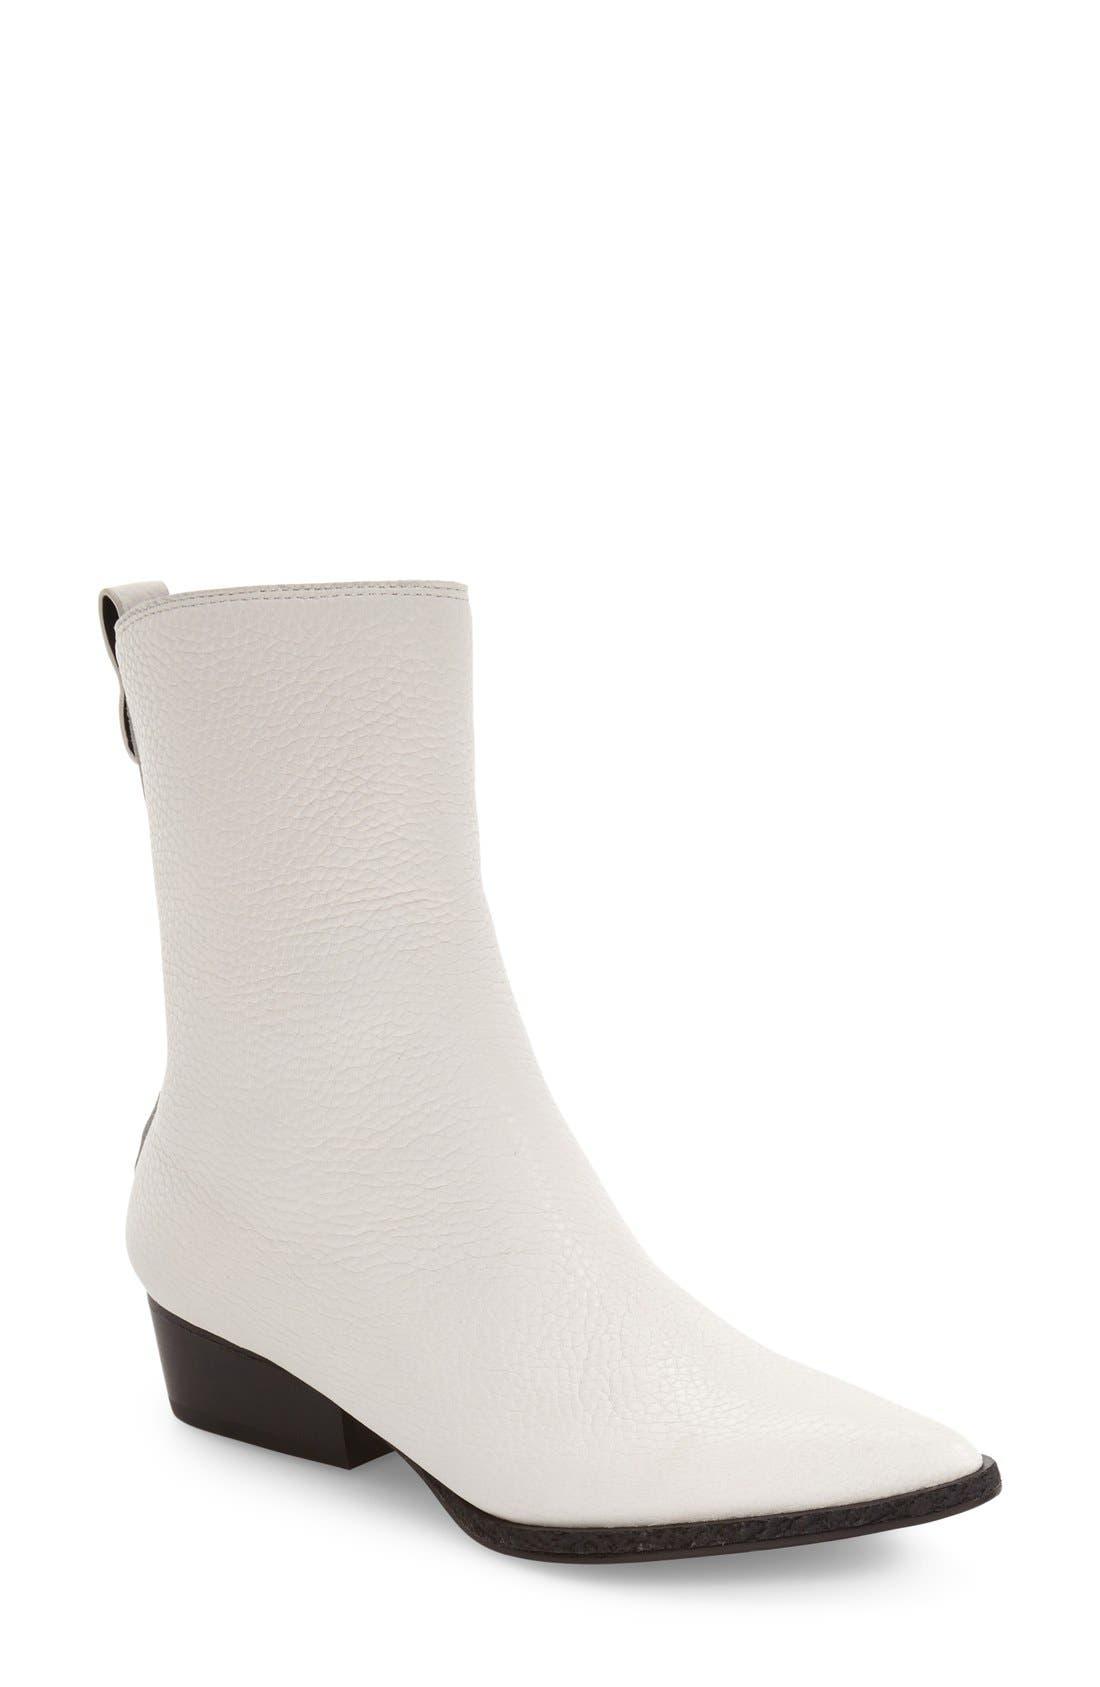 Kiki Pointy Toe Bootie,                             Main thumbnail 1, color,                             White Leather